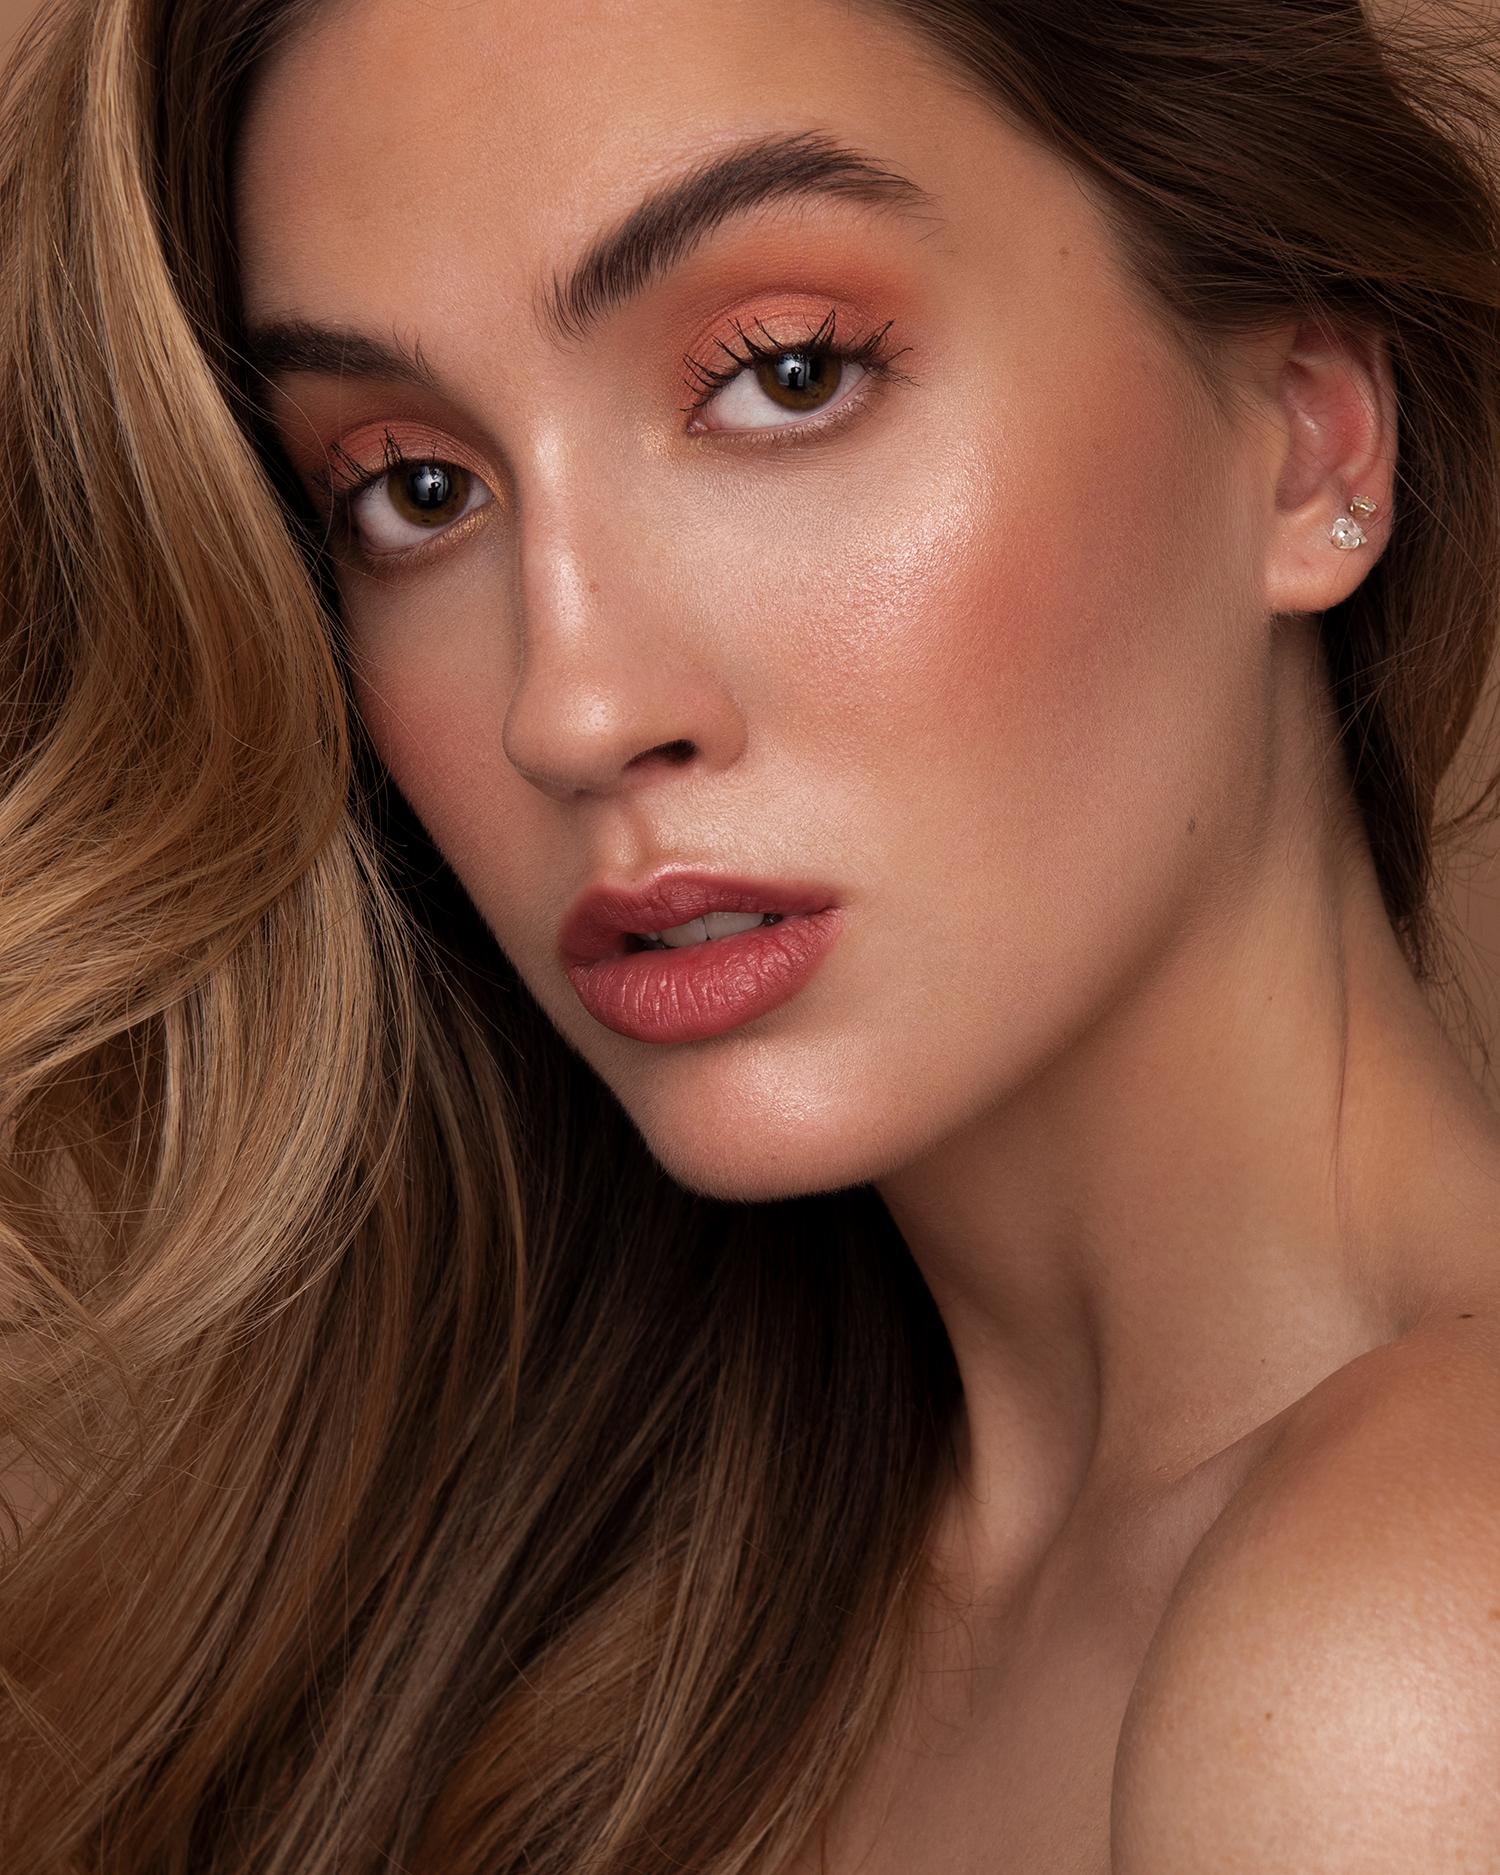 Shine-Model-Management-NYC-Petite-Sarah-01_210526_232238.JPG#asset:52755